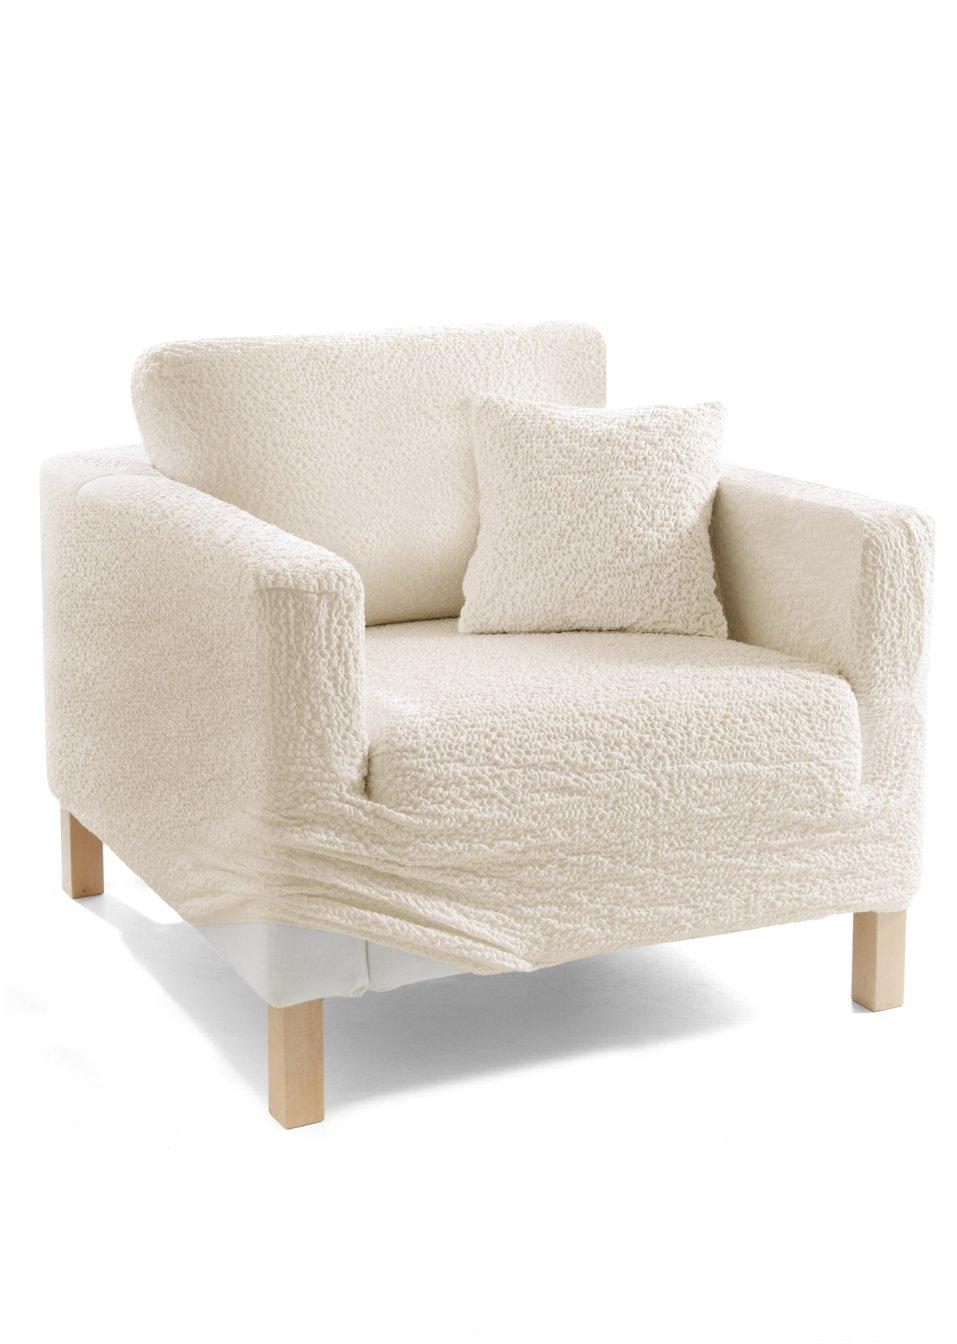 Full Size of Husse Sofa Ecksofa Stretch Mit Ottomane 3 Sitzer Couch U Form Modernes Design Fr Sitzmbel Creme L Form Rolf Benz 2er Grau Garnitur Rund U Echtleder Megapol Sofa Husse Sofa